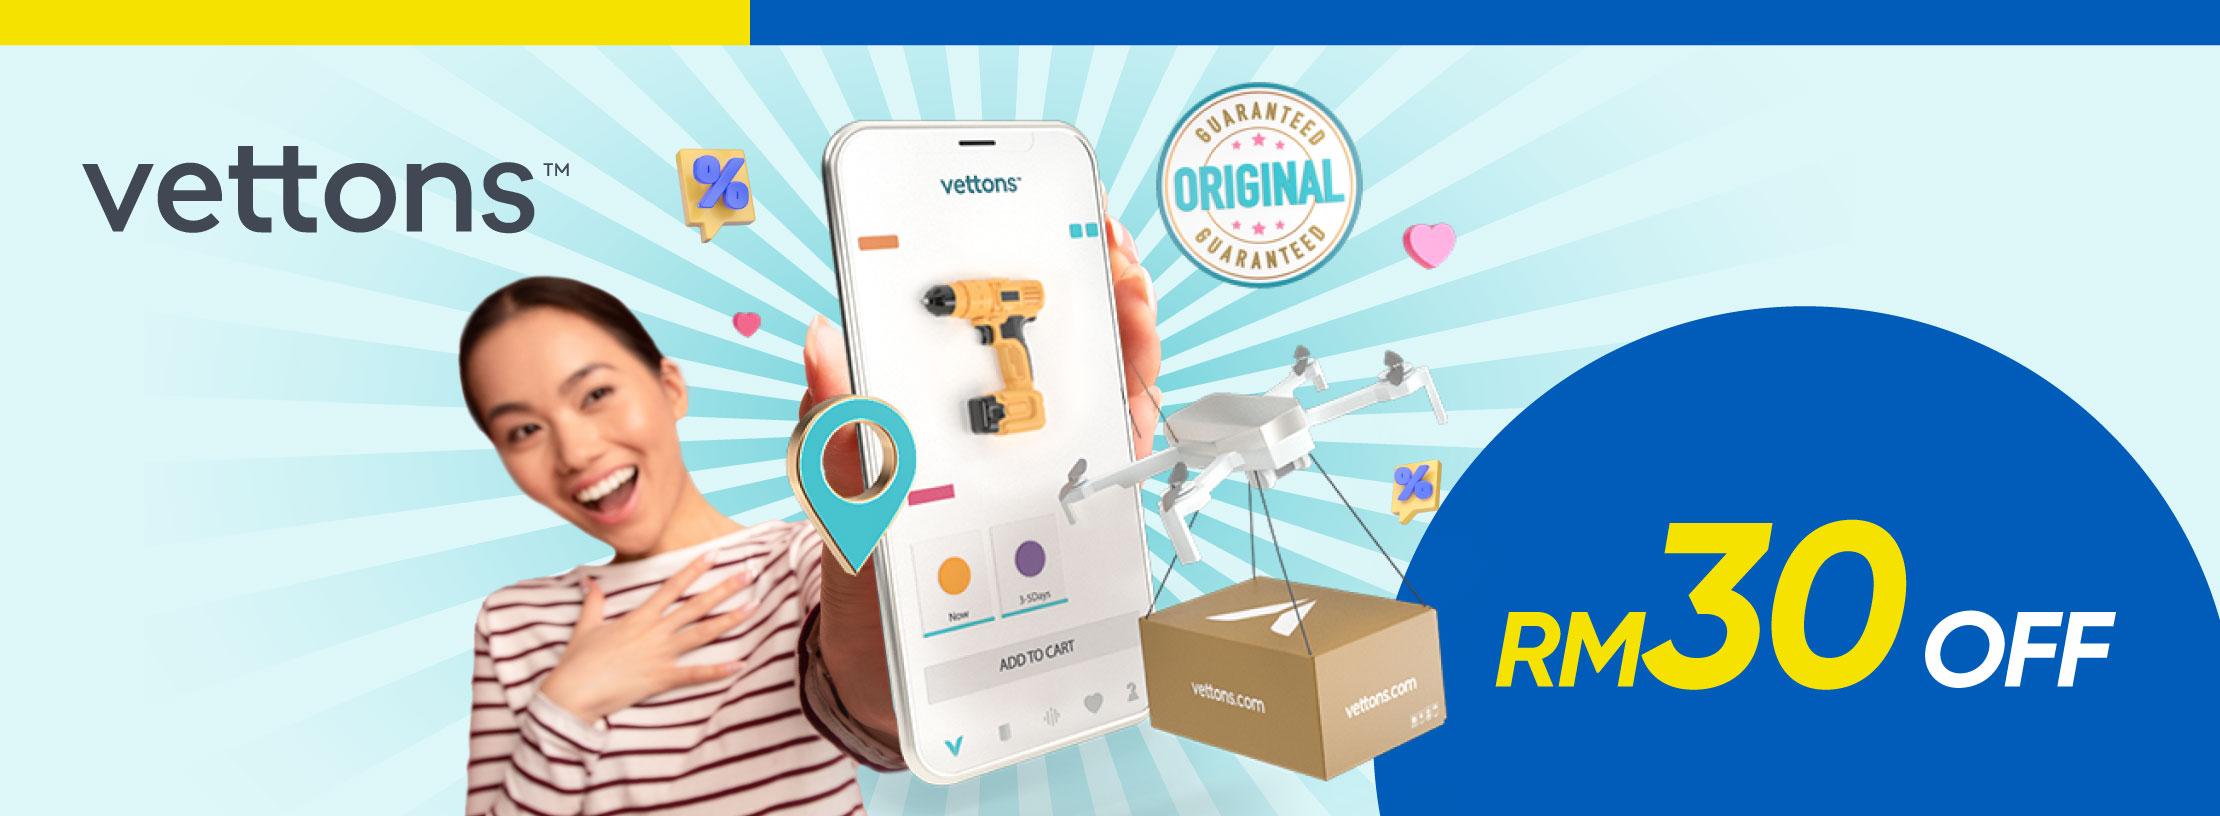 Vetton's Online Campaign: RM30 Off